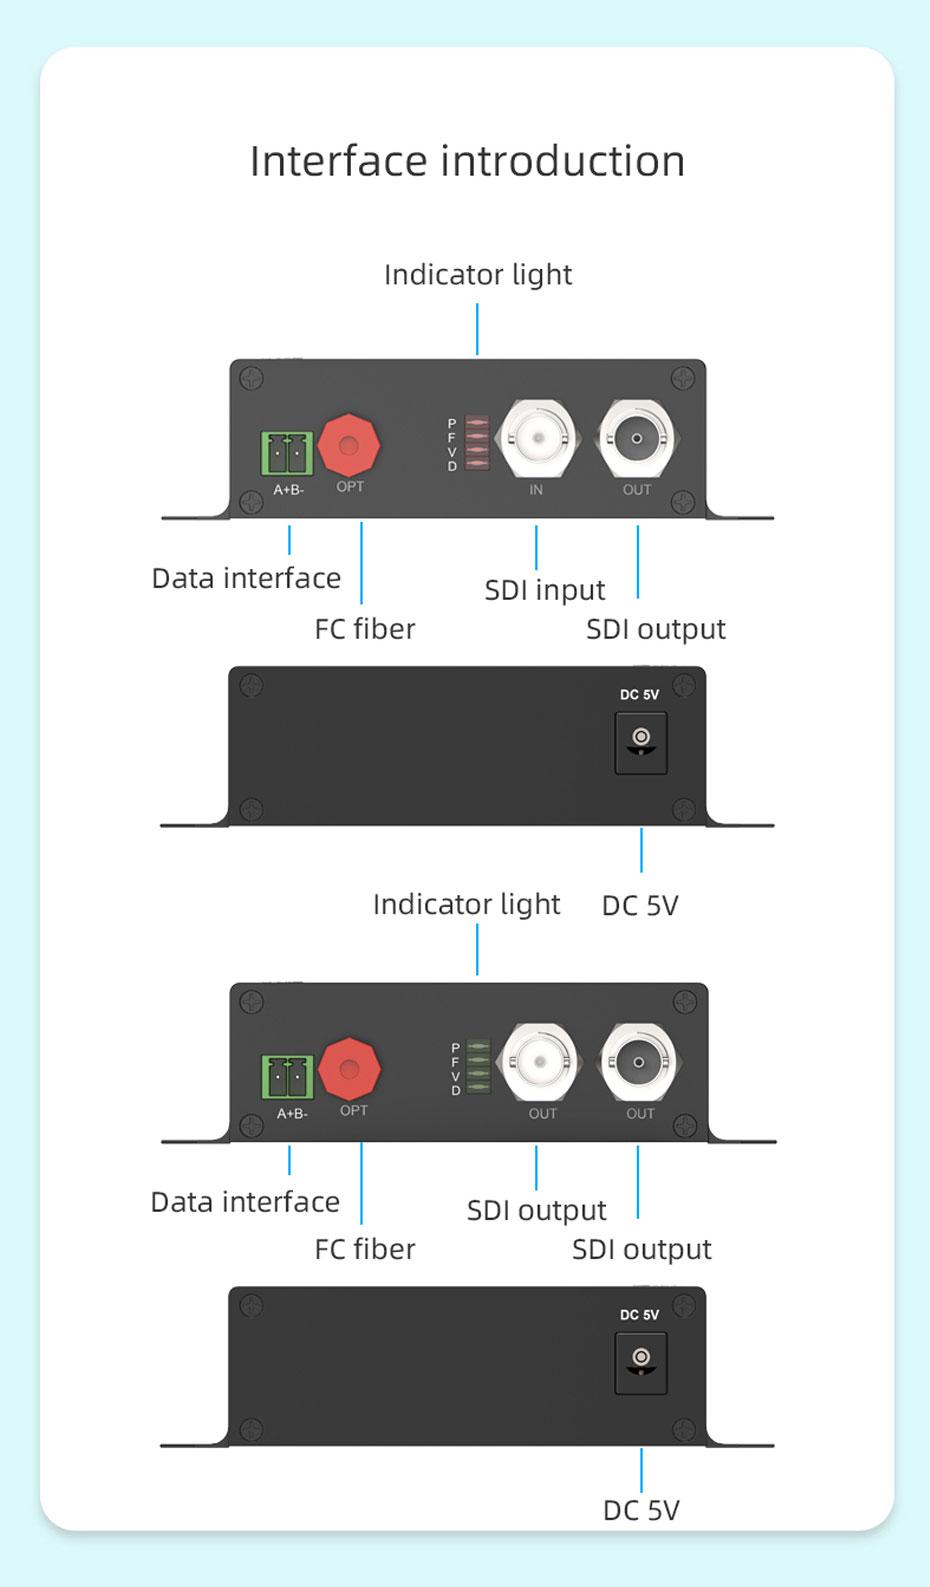 20km SDI optical transceiver SDF01 interface introduction